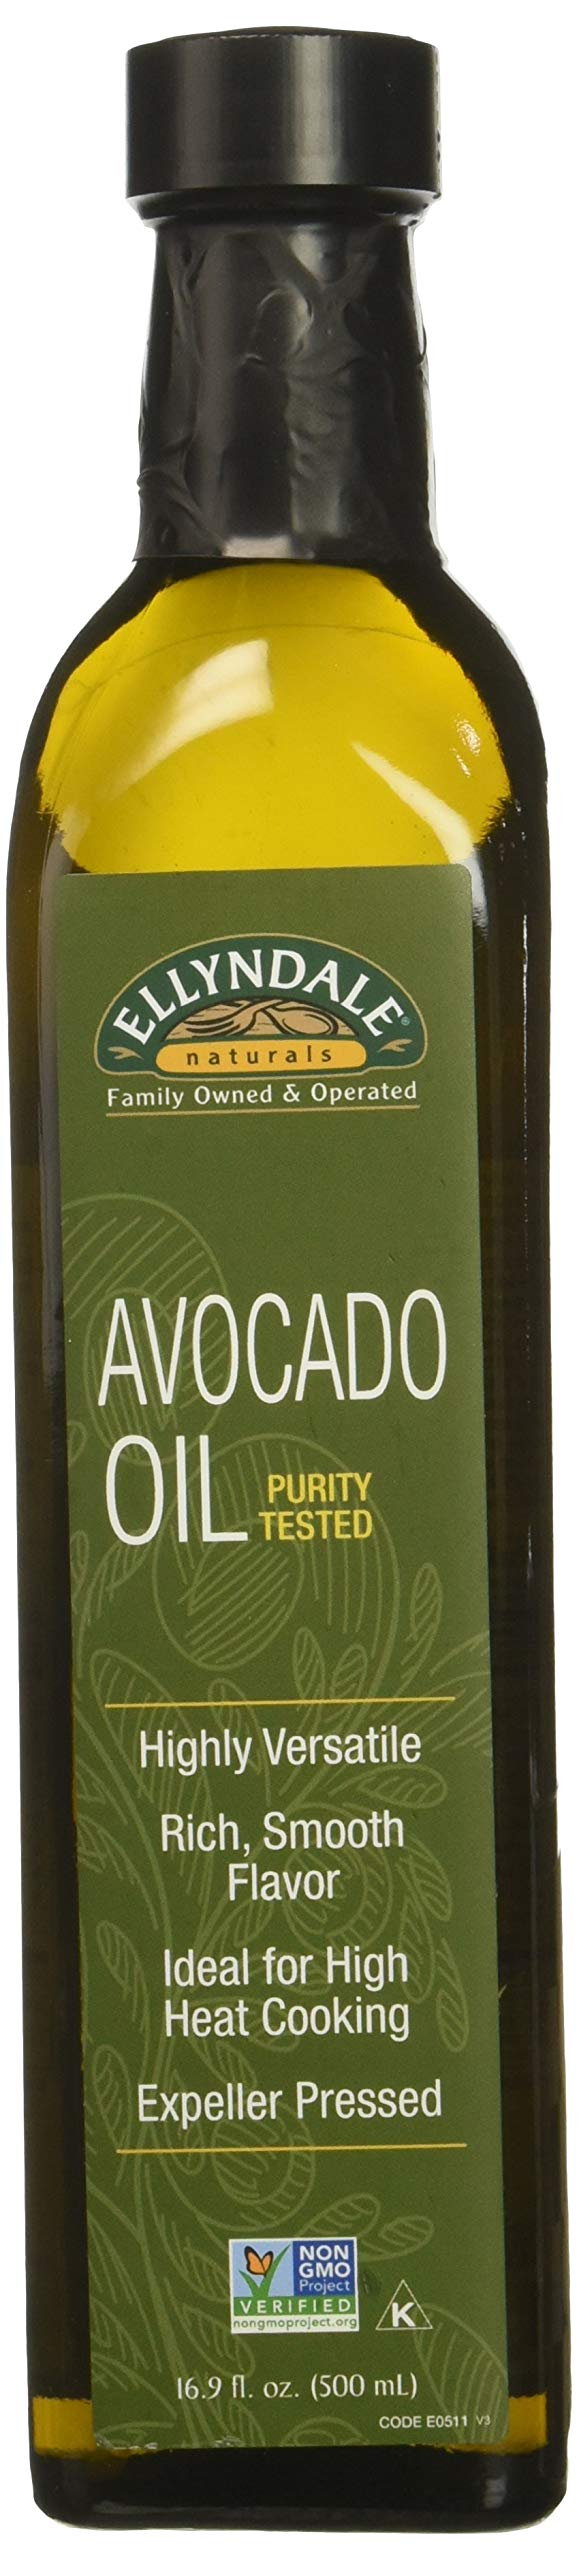 NOW Foods Ellyndale Naturals Avocado Oil